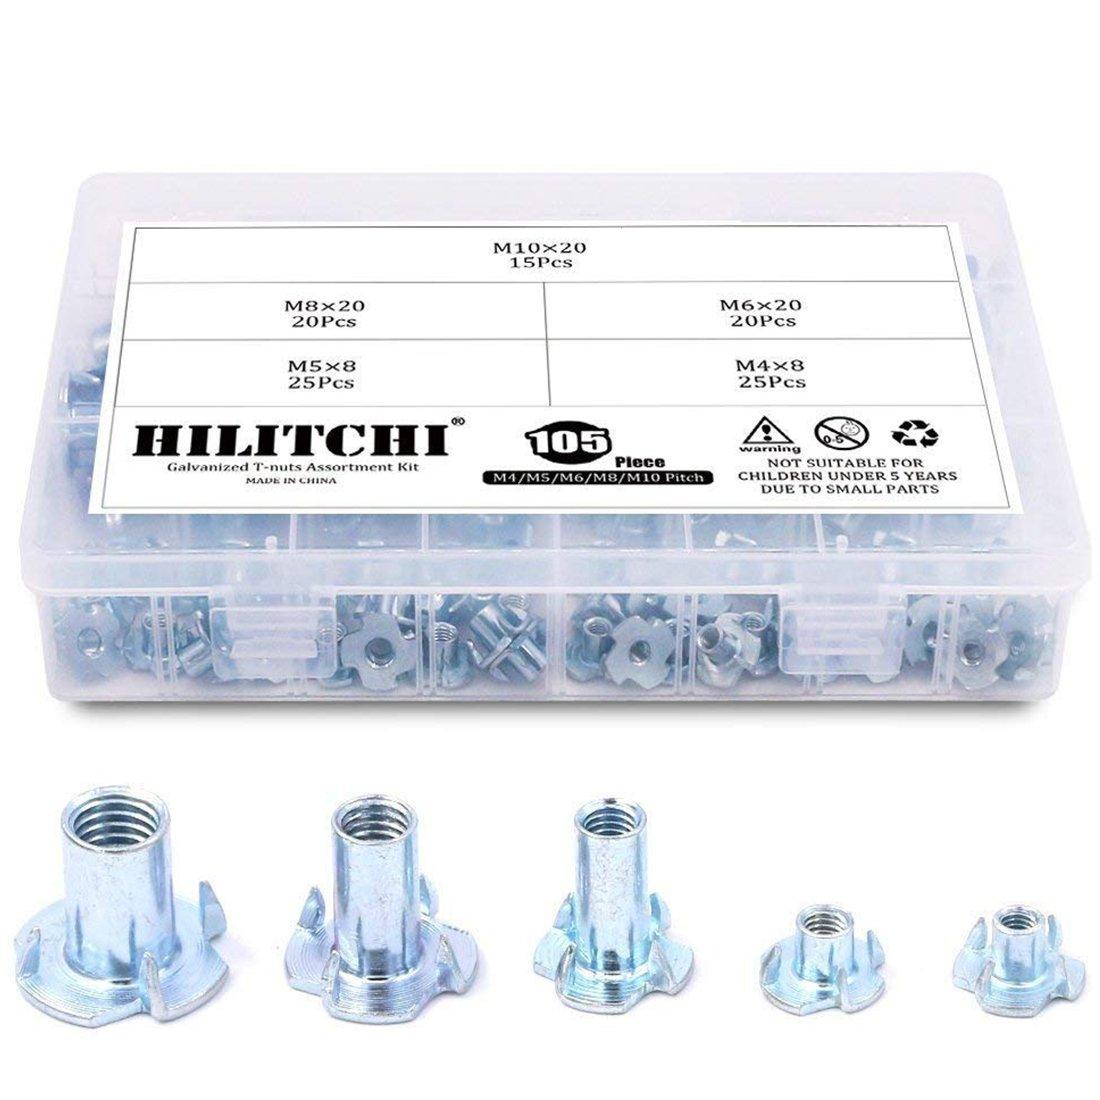 Hilitchi 105 Pcs M4 5 6 8 10 Zinc Plated Steel T Nut Assortment Kit